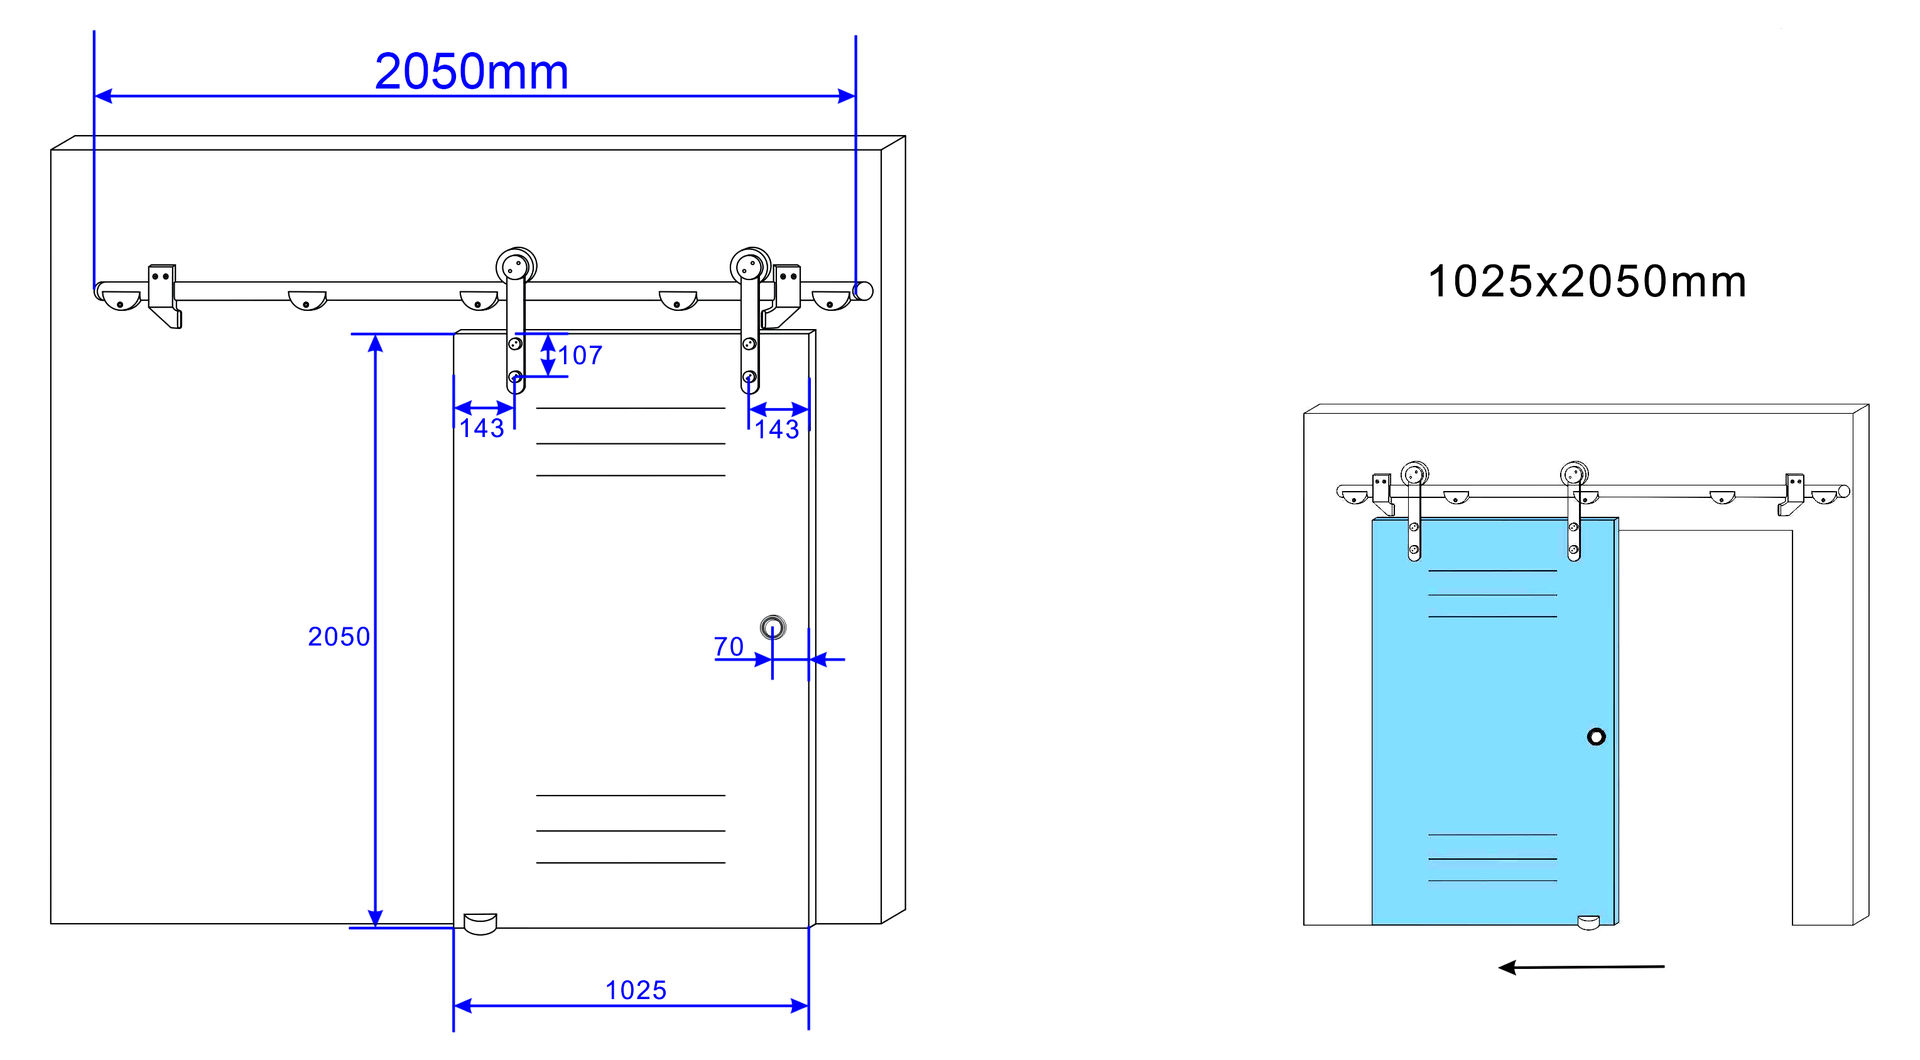 glas schiebet r 205cm in klarglas milchglas o gestreift. Black Bedroom Furniture Sets. Home Design Ideas